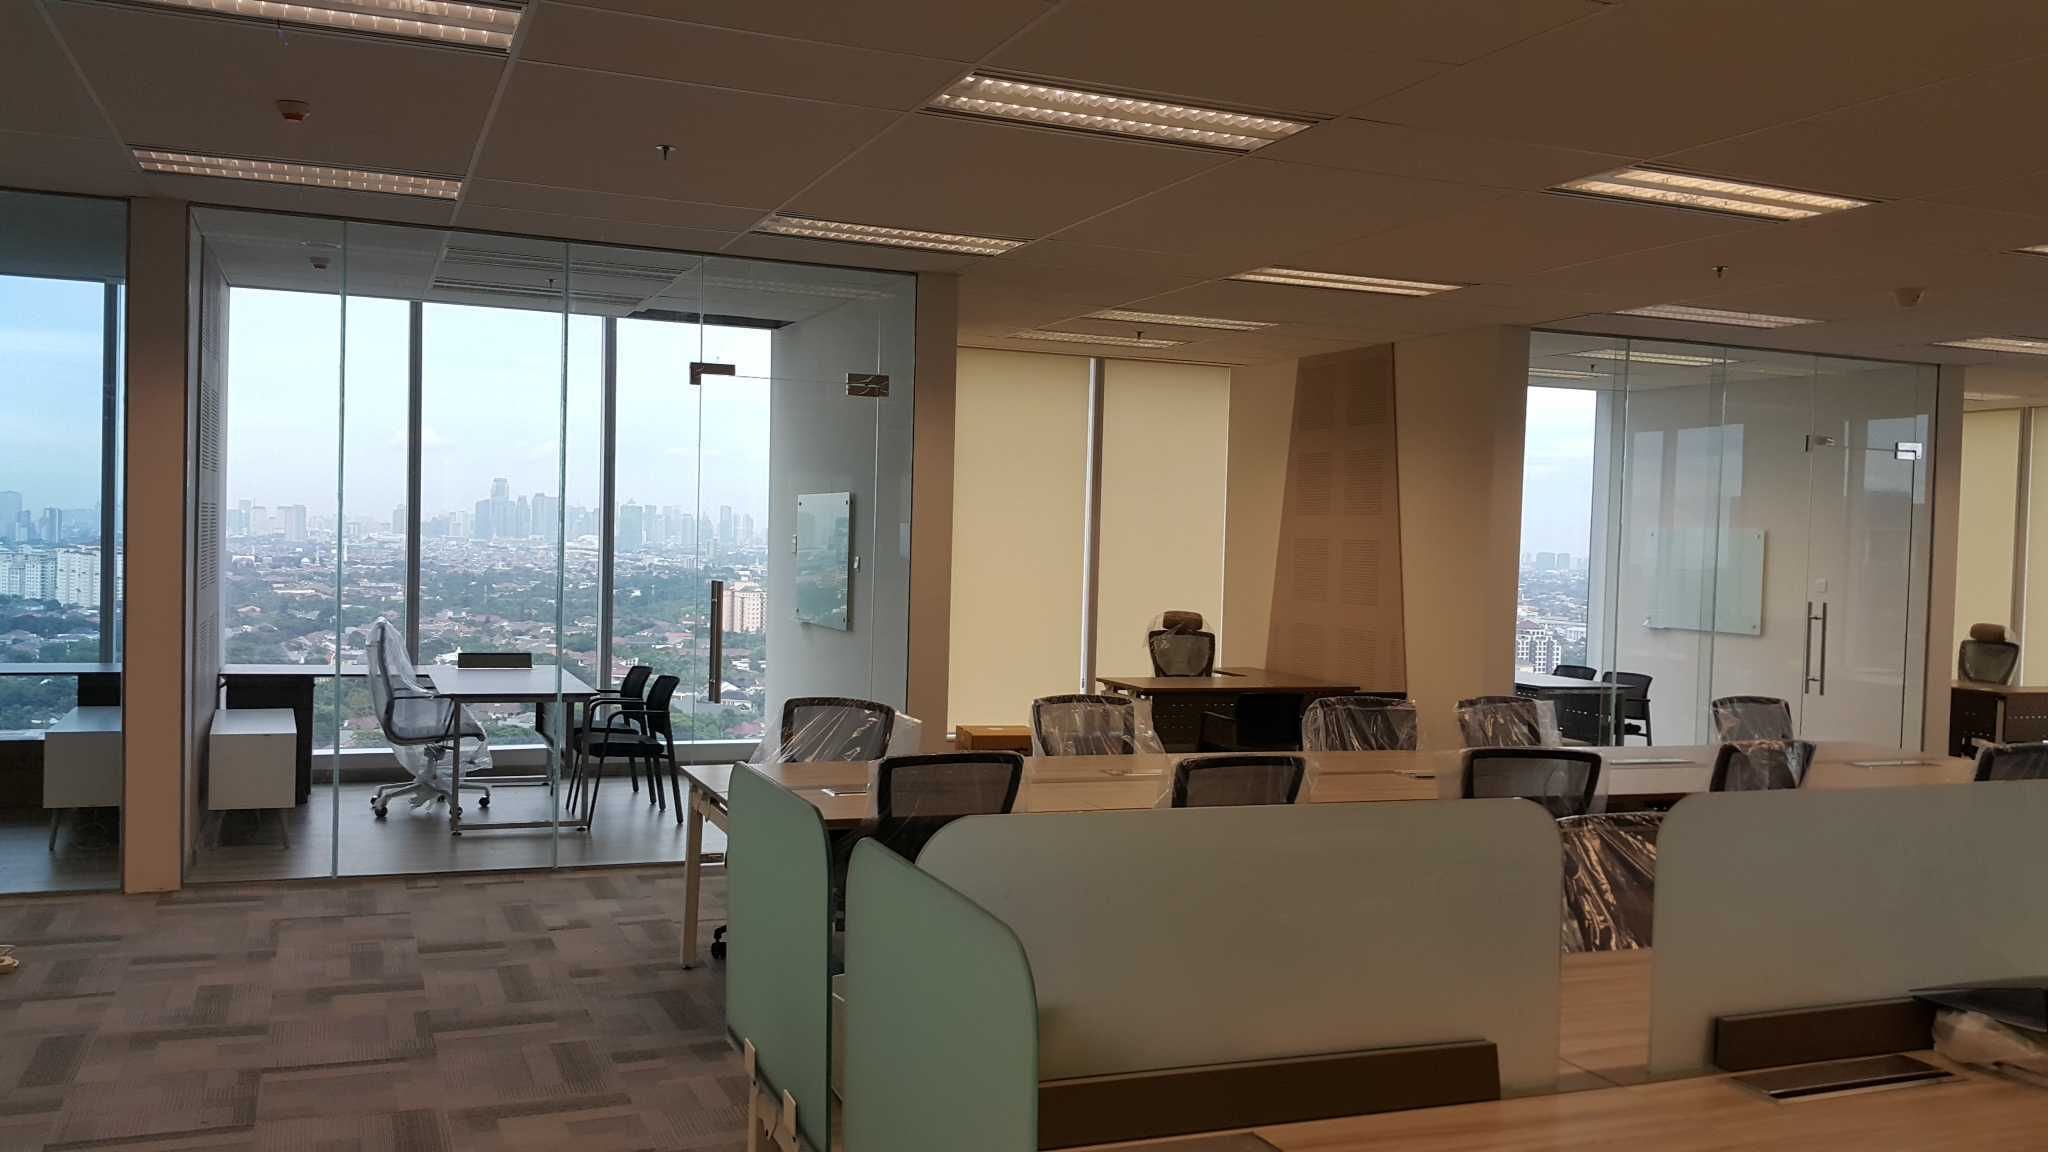 Arsindo Cipta Karya Pt Boral Jayaboard Jakarta Jakarta Working Area Minimalis  26138